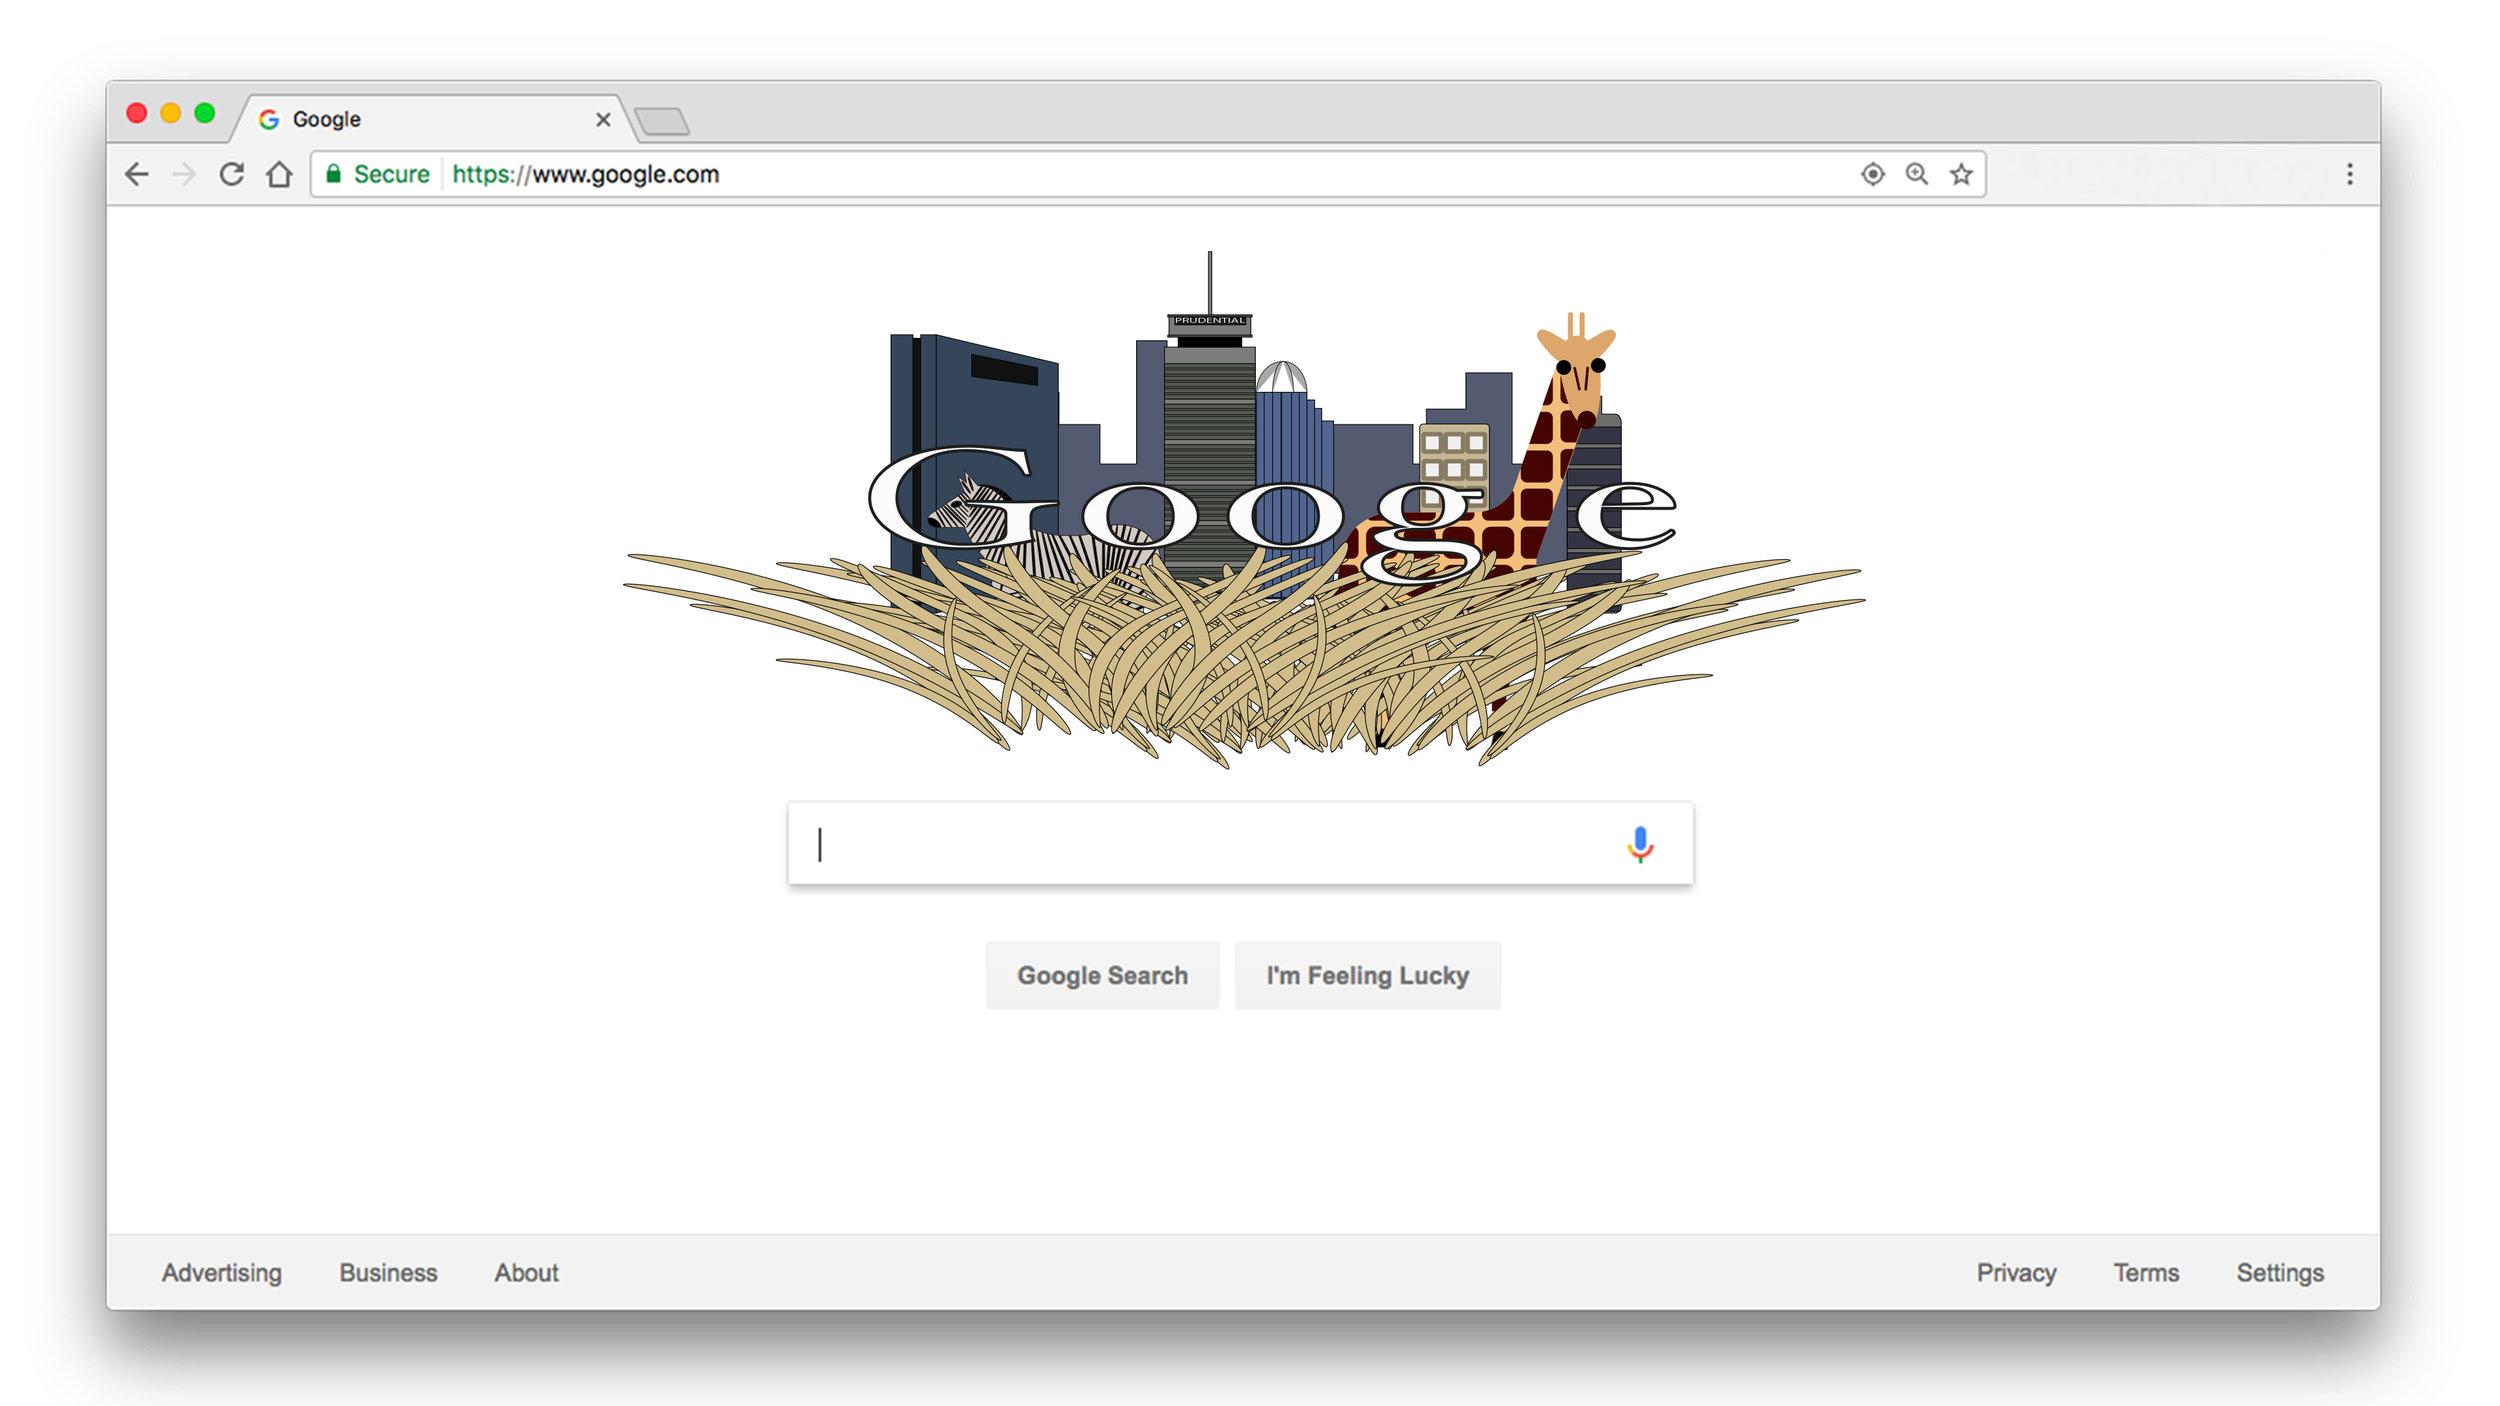 abidedir_5753438_117549199_Abid_Final Google Doodle.jpg